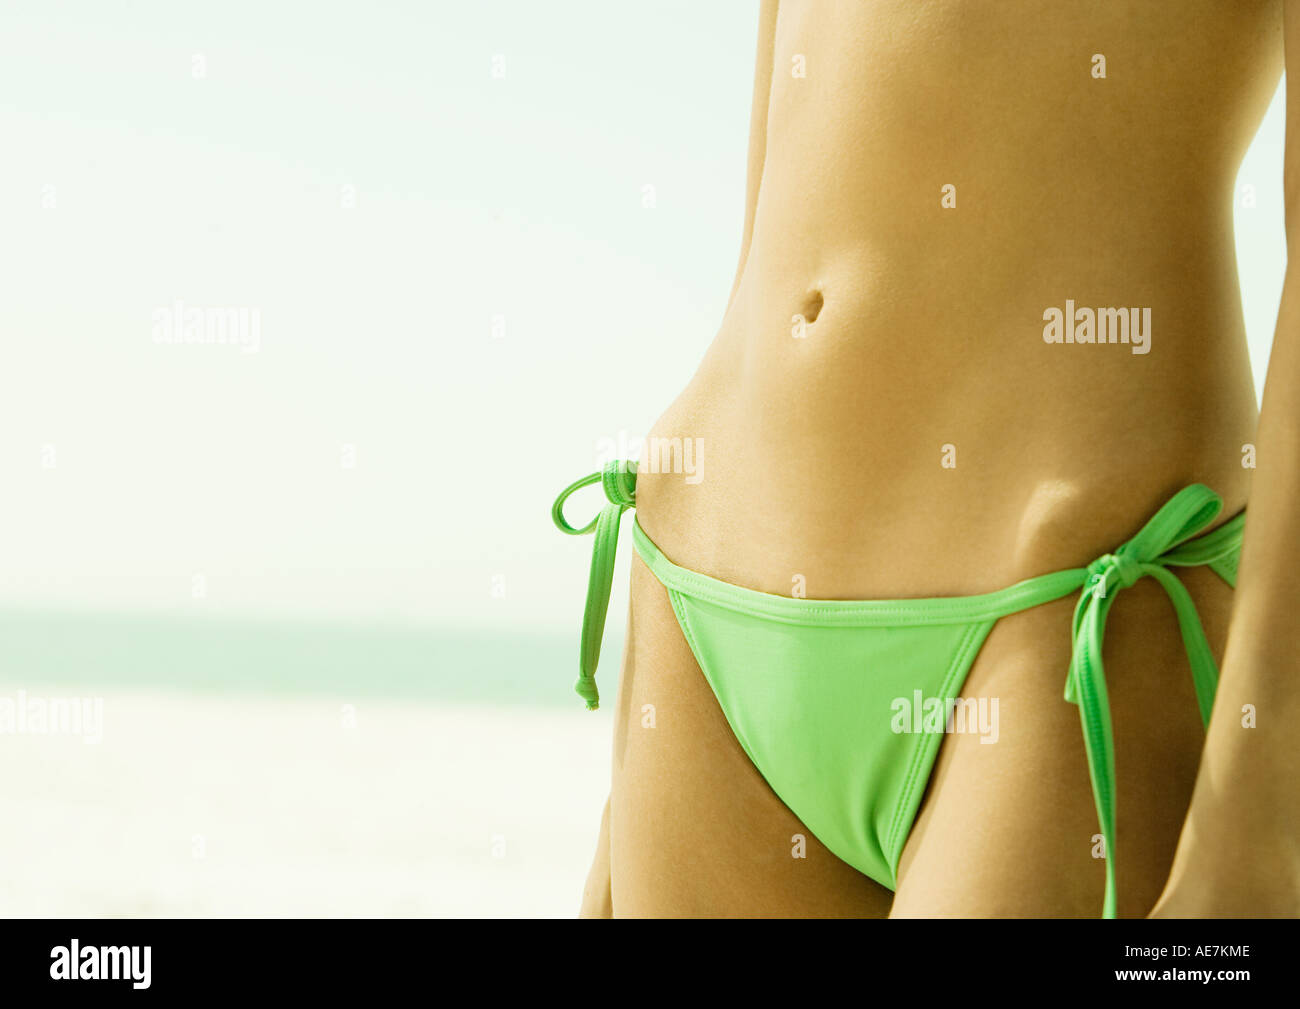 Woman wearing string bikini, close-up of abdomen - Stock Image